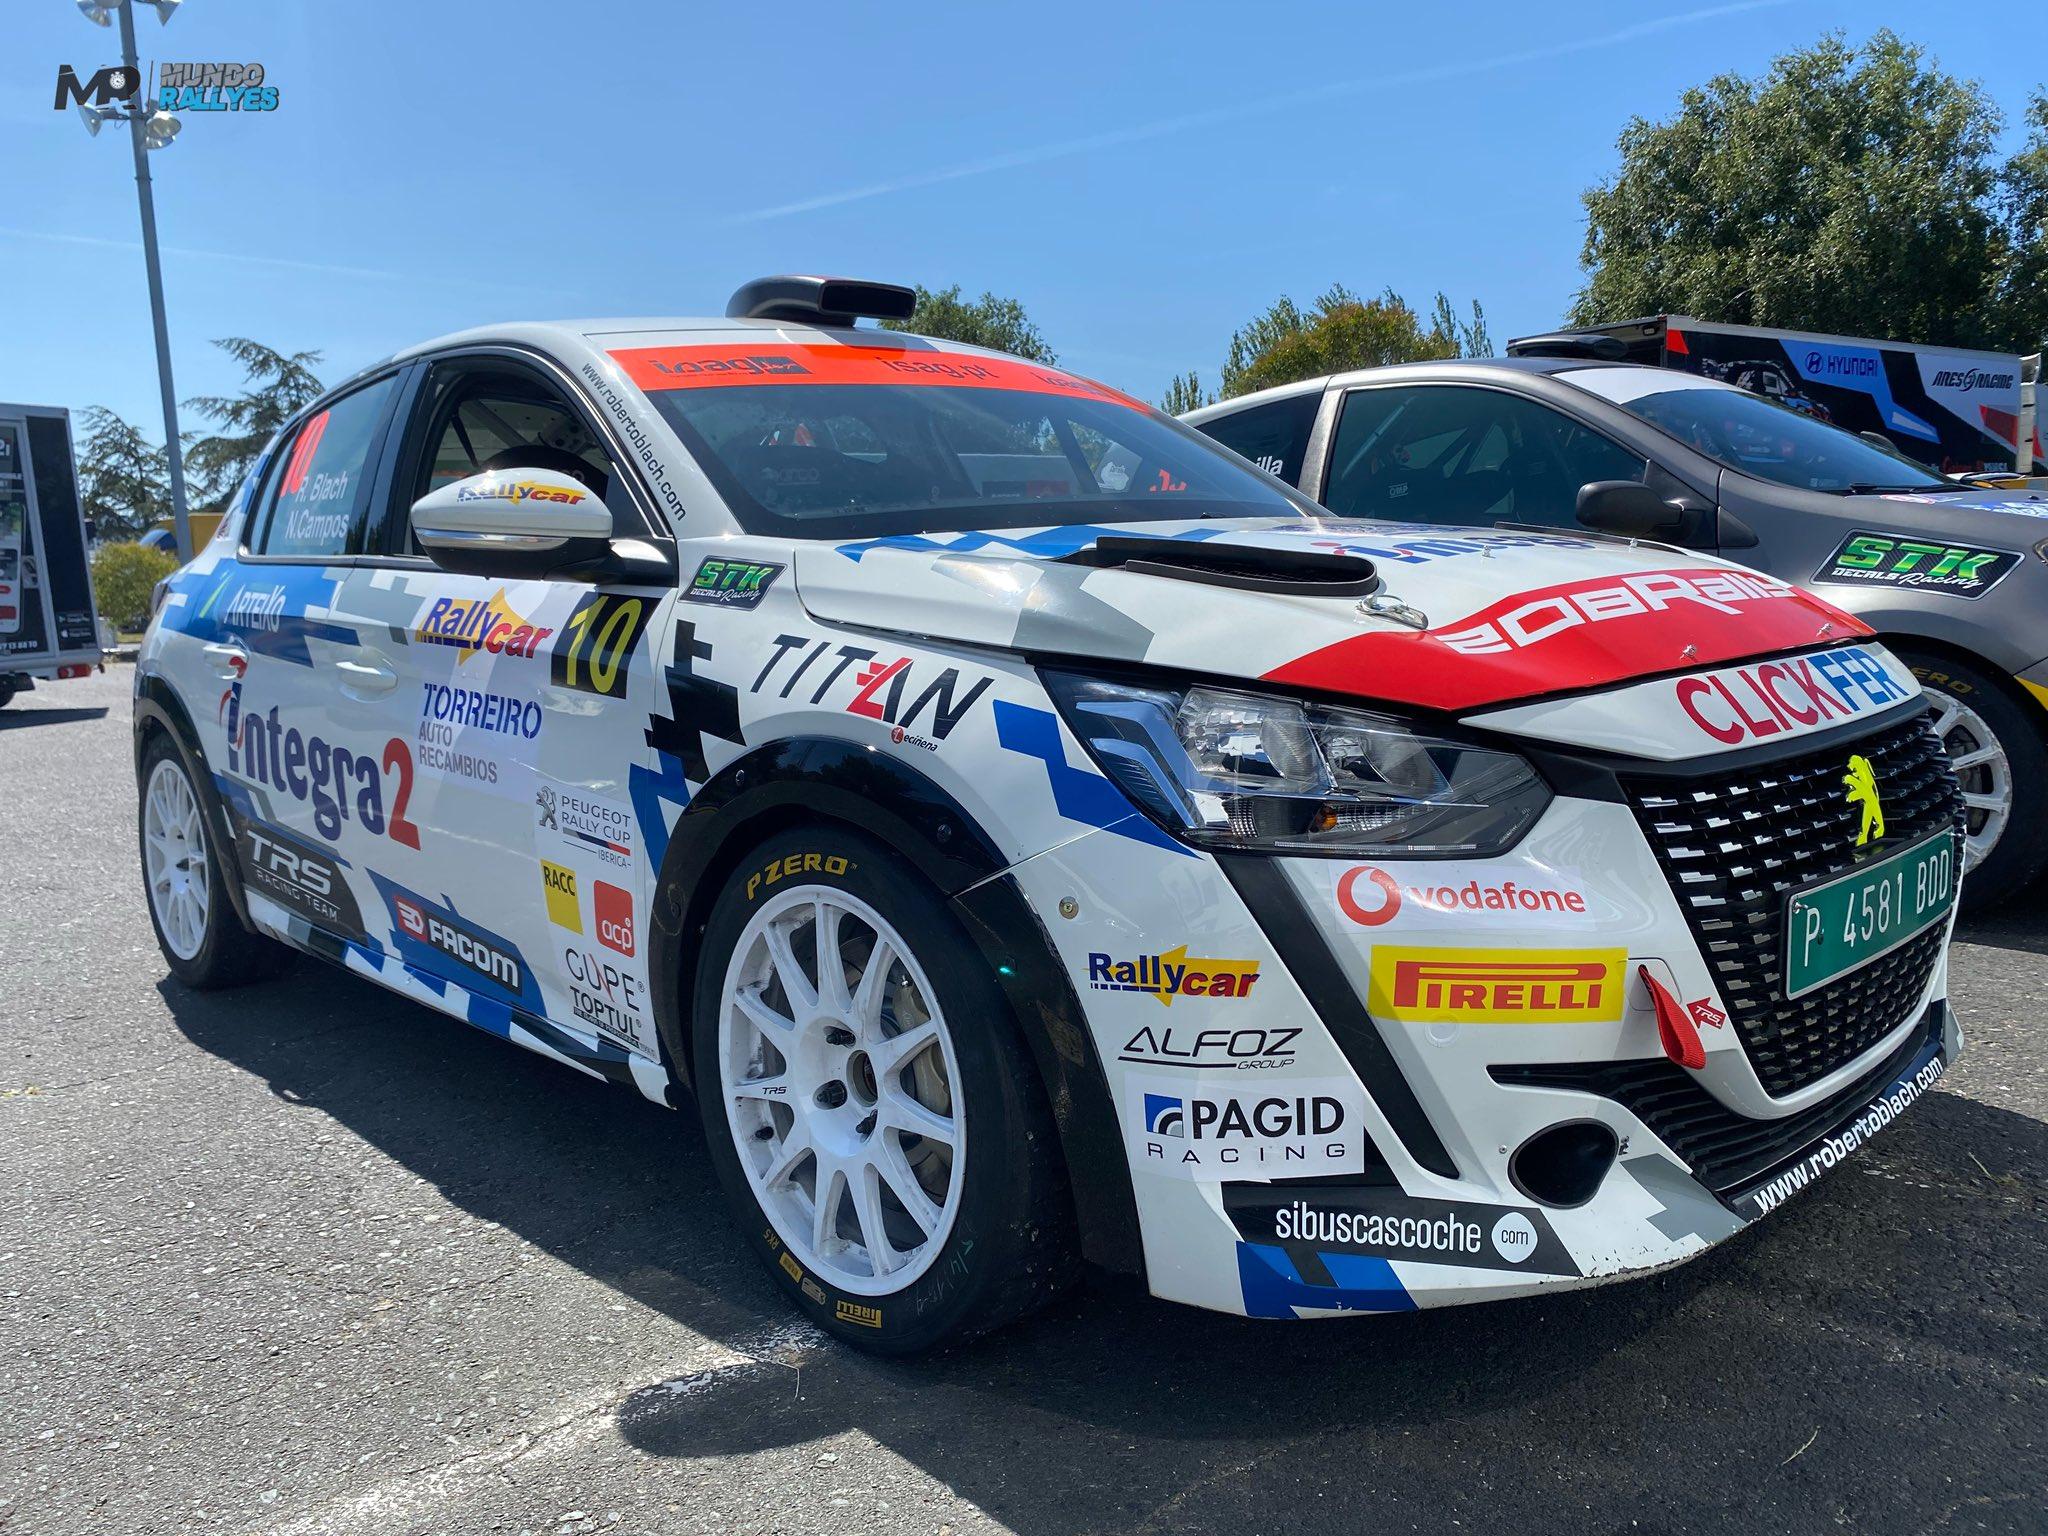 SCER + TER: 52º Rallye de Ferrol - Suzuki [20-21 Agosto] E9KuMbDWUAQf9Aw?format=jpg&name=large